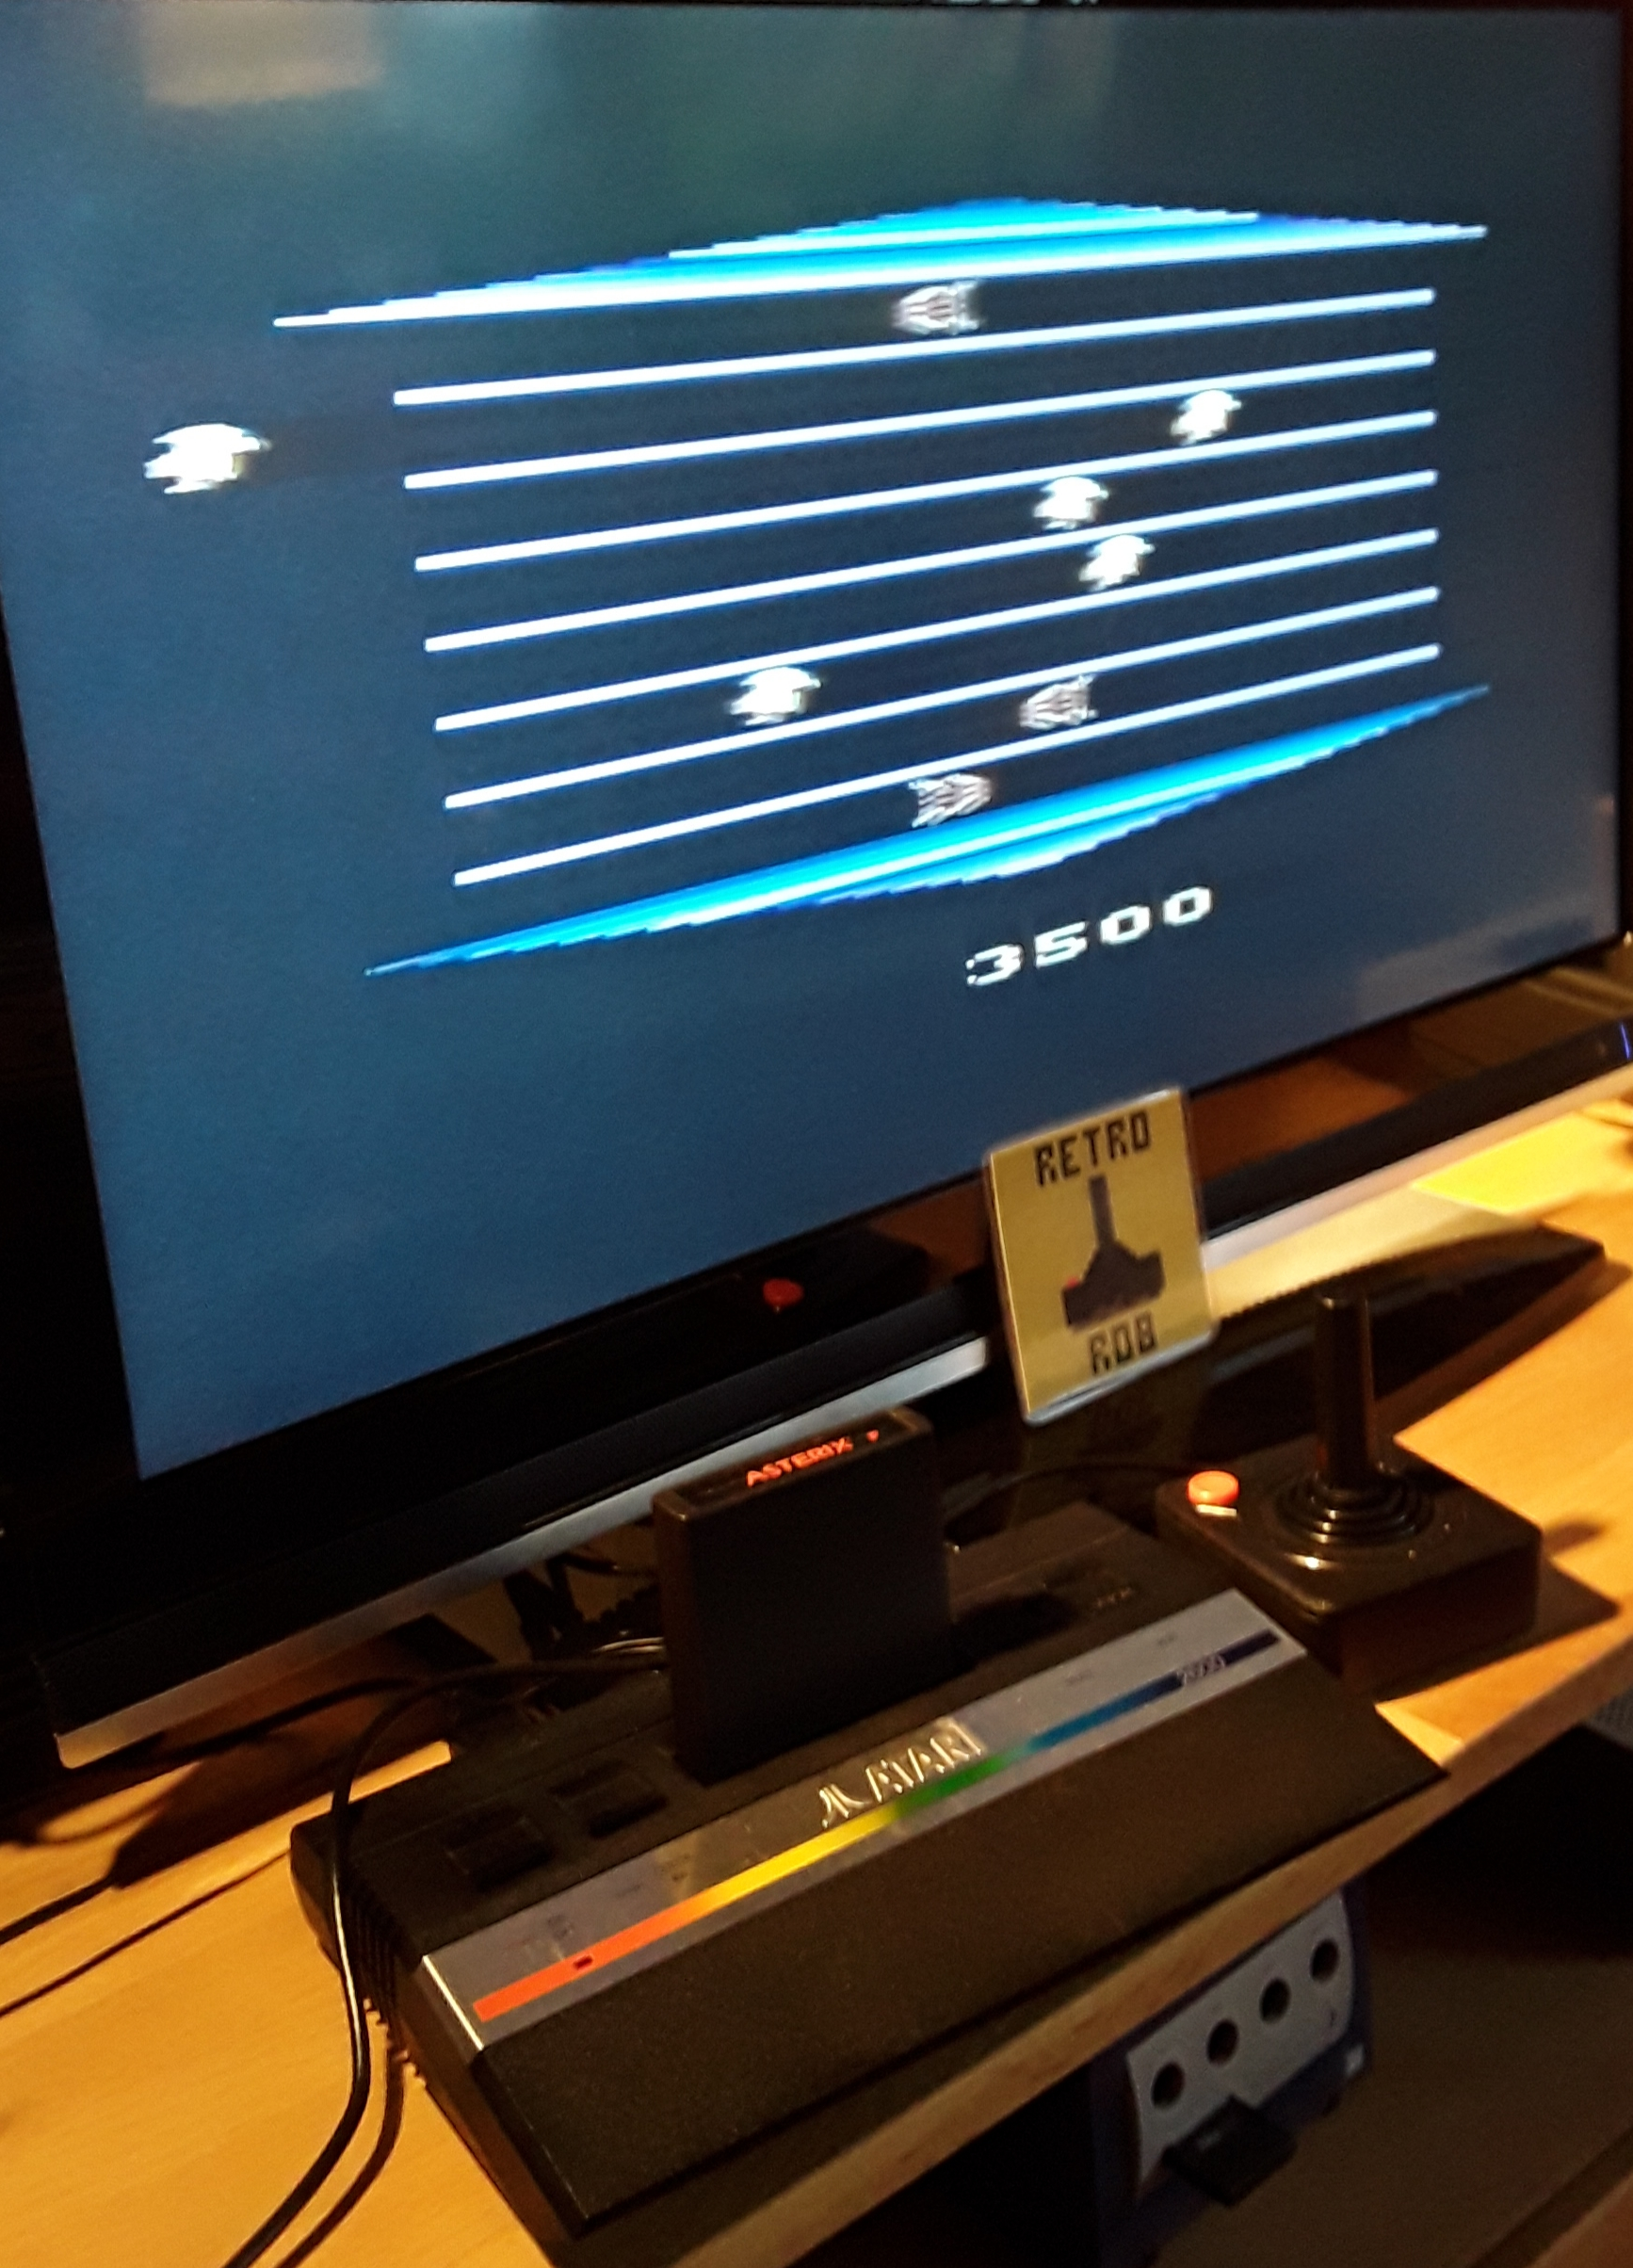 RetroRob: Asterix (Atari 2600) 3,500 points on 2018-12-15 03:11:55